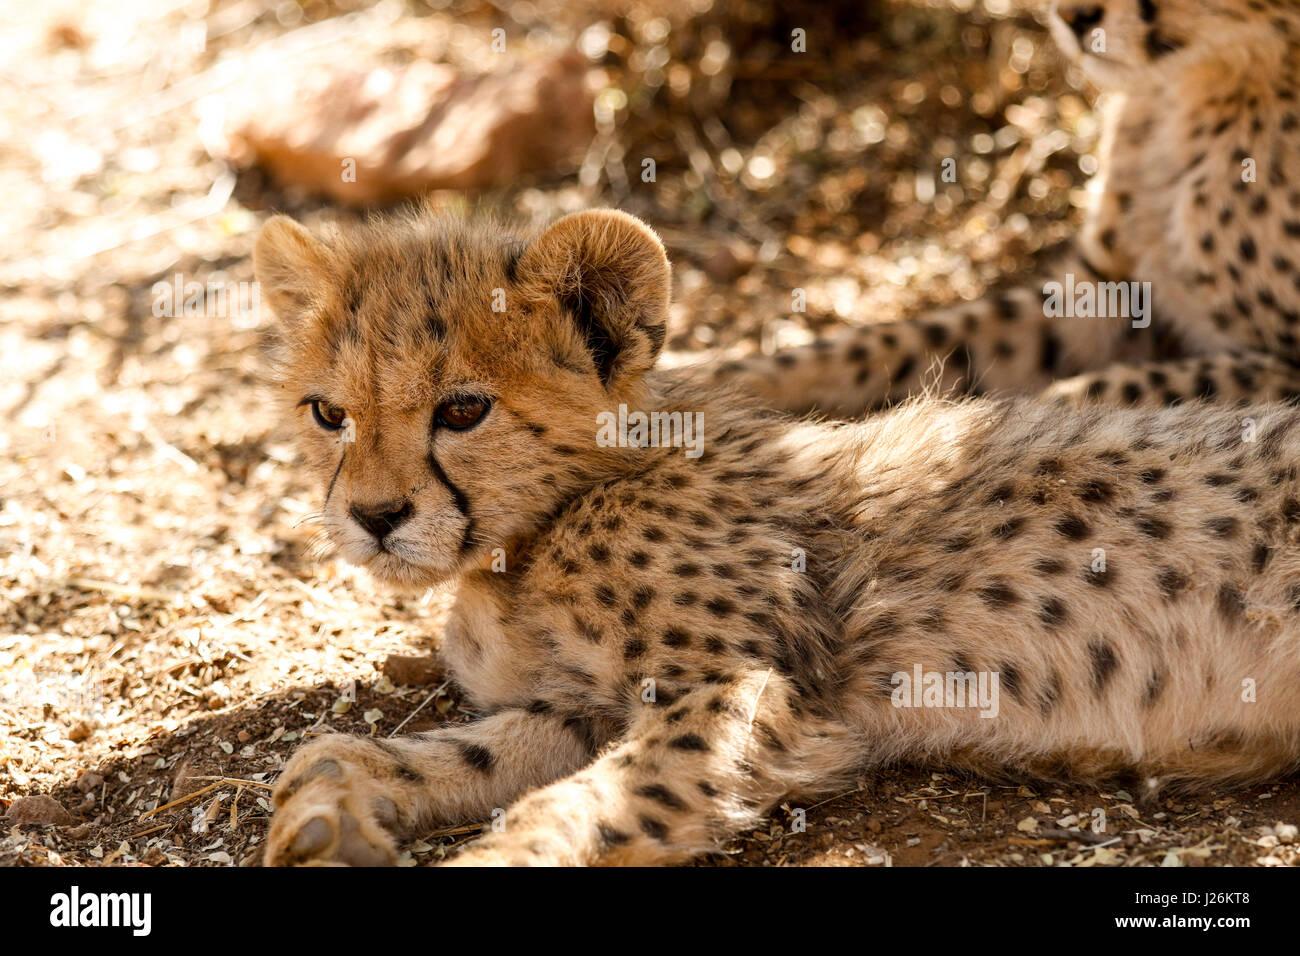 Baby Cheetahs Playing Stock Photos Baby Cheetahs Playing Stock